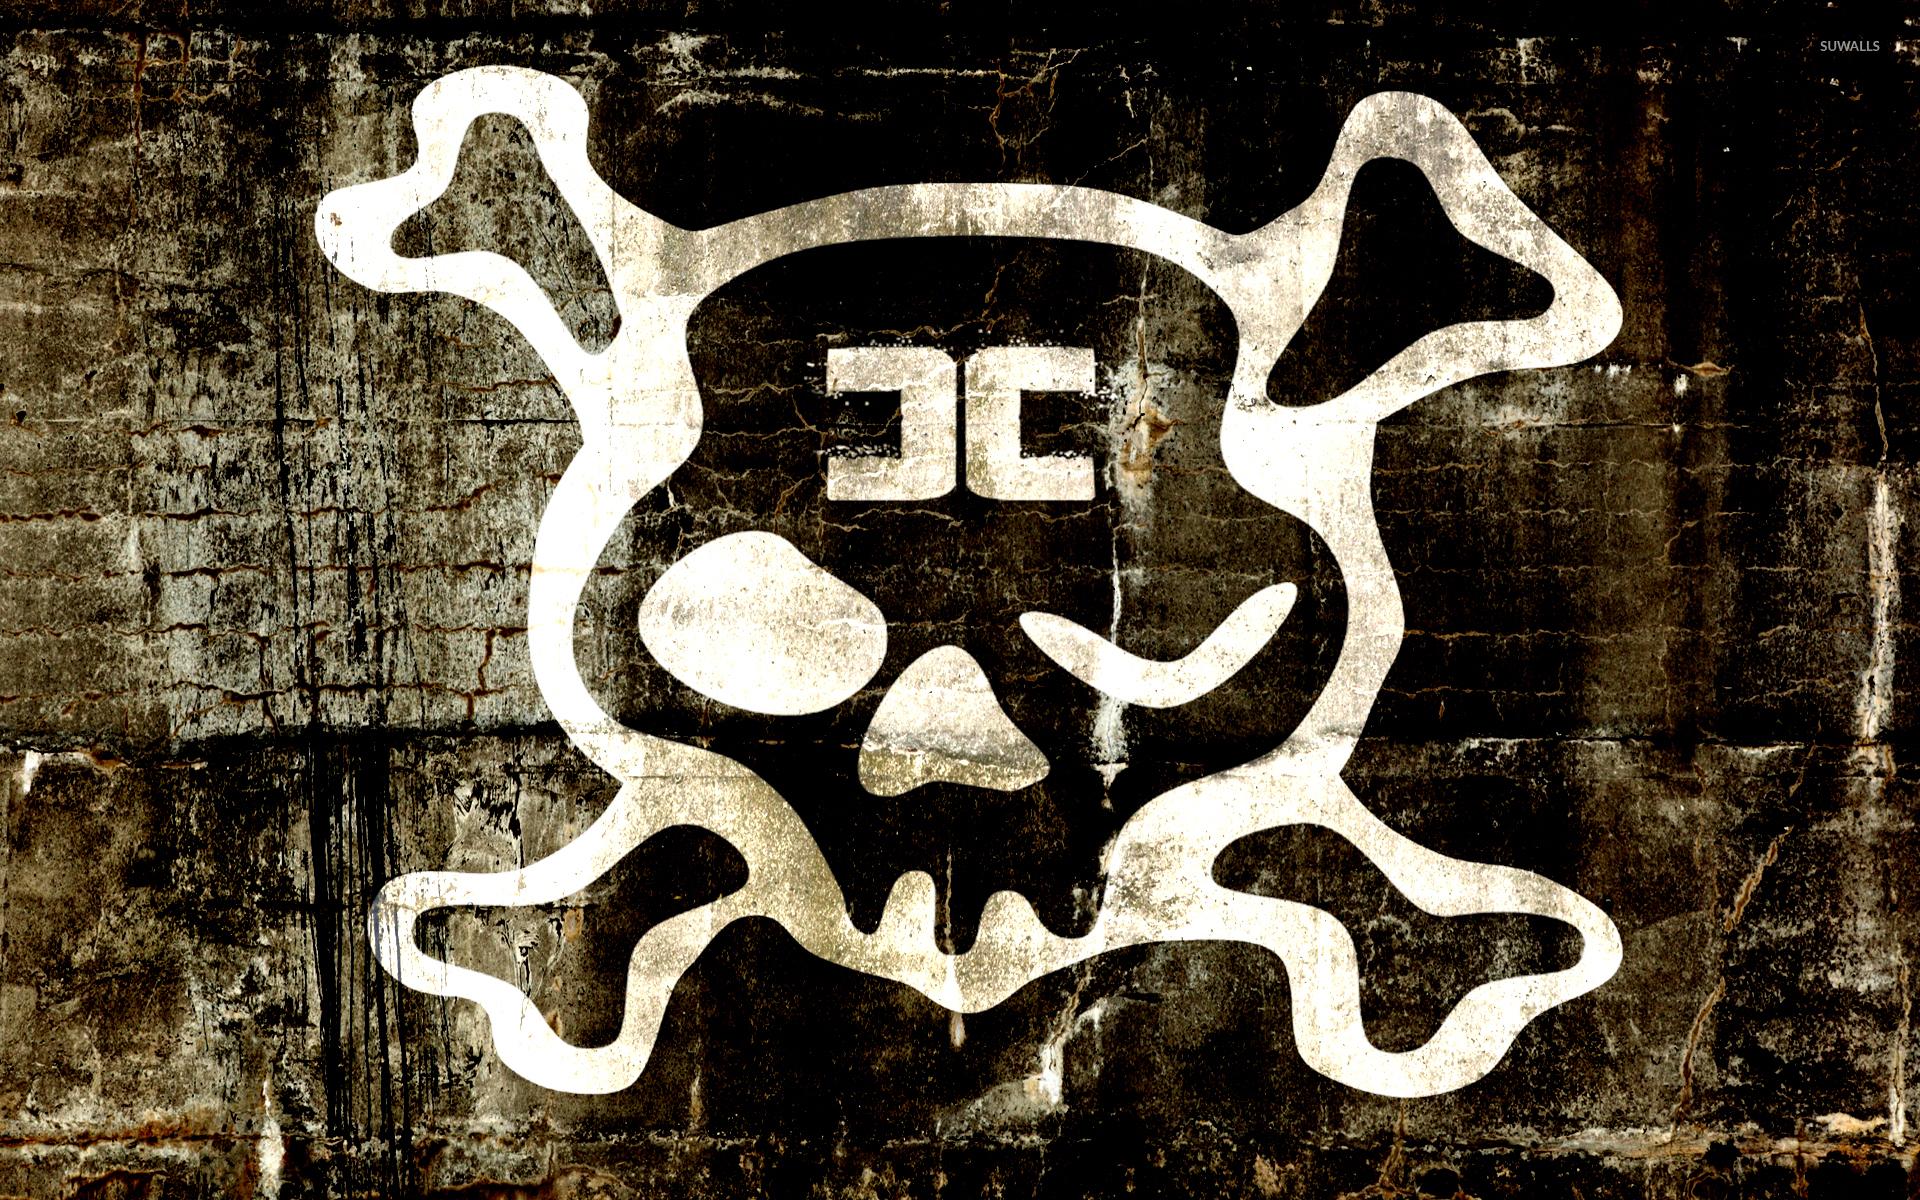 Call Of Duty Black Ops II Skull Wallpaper